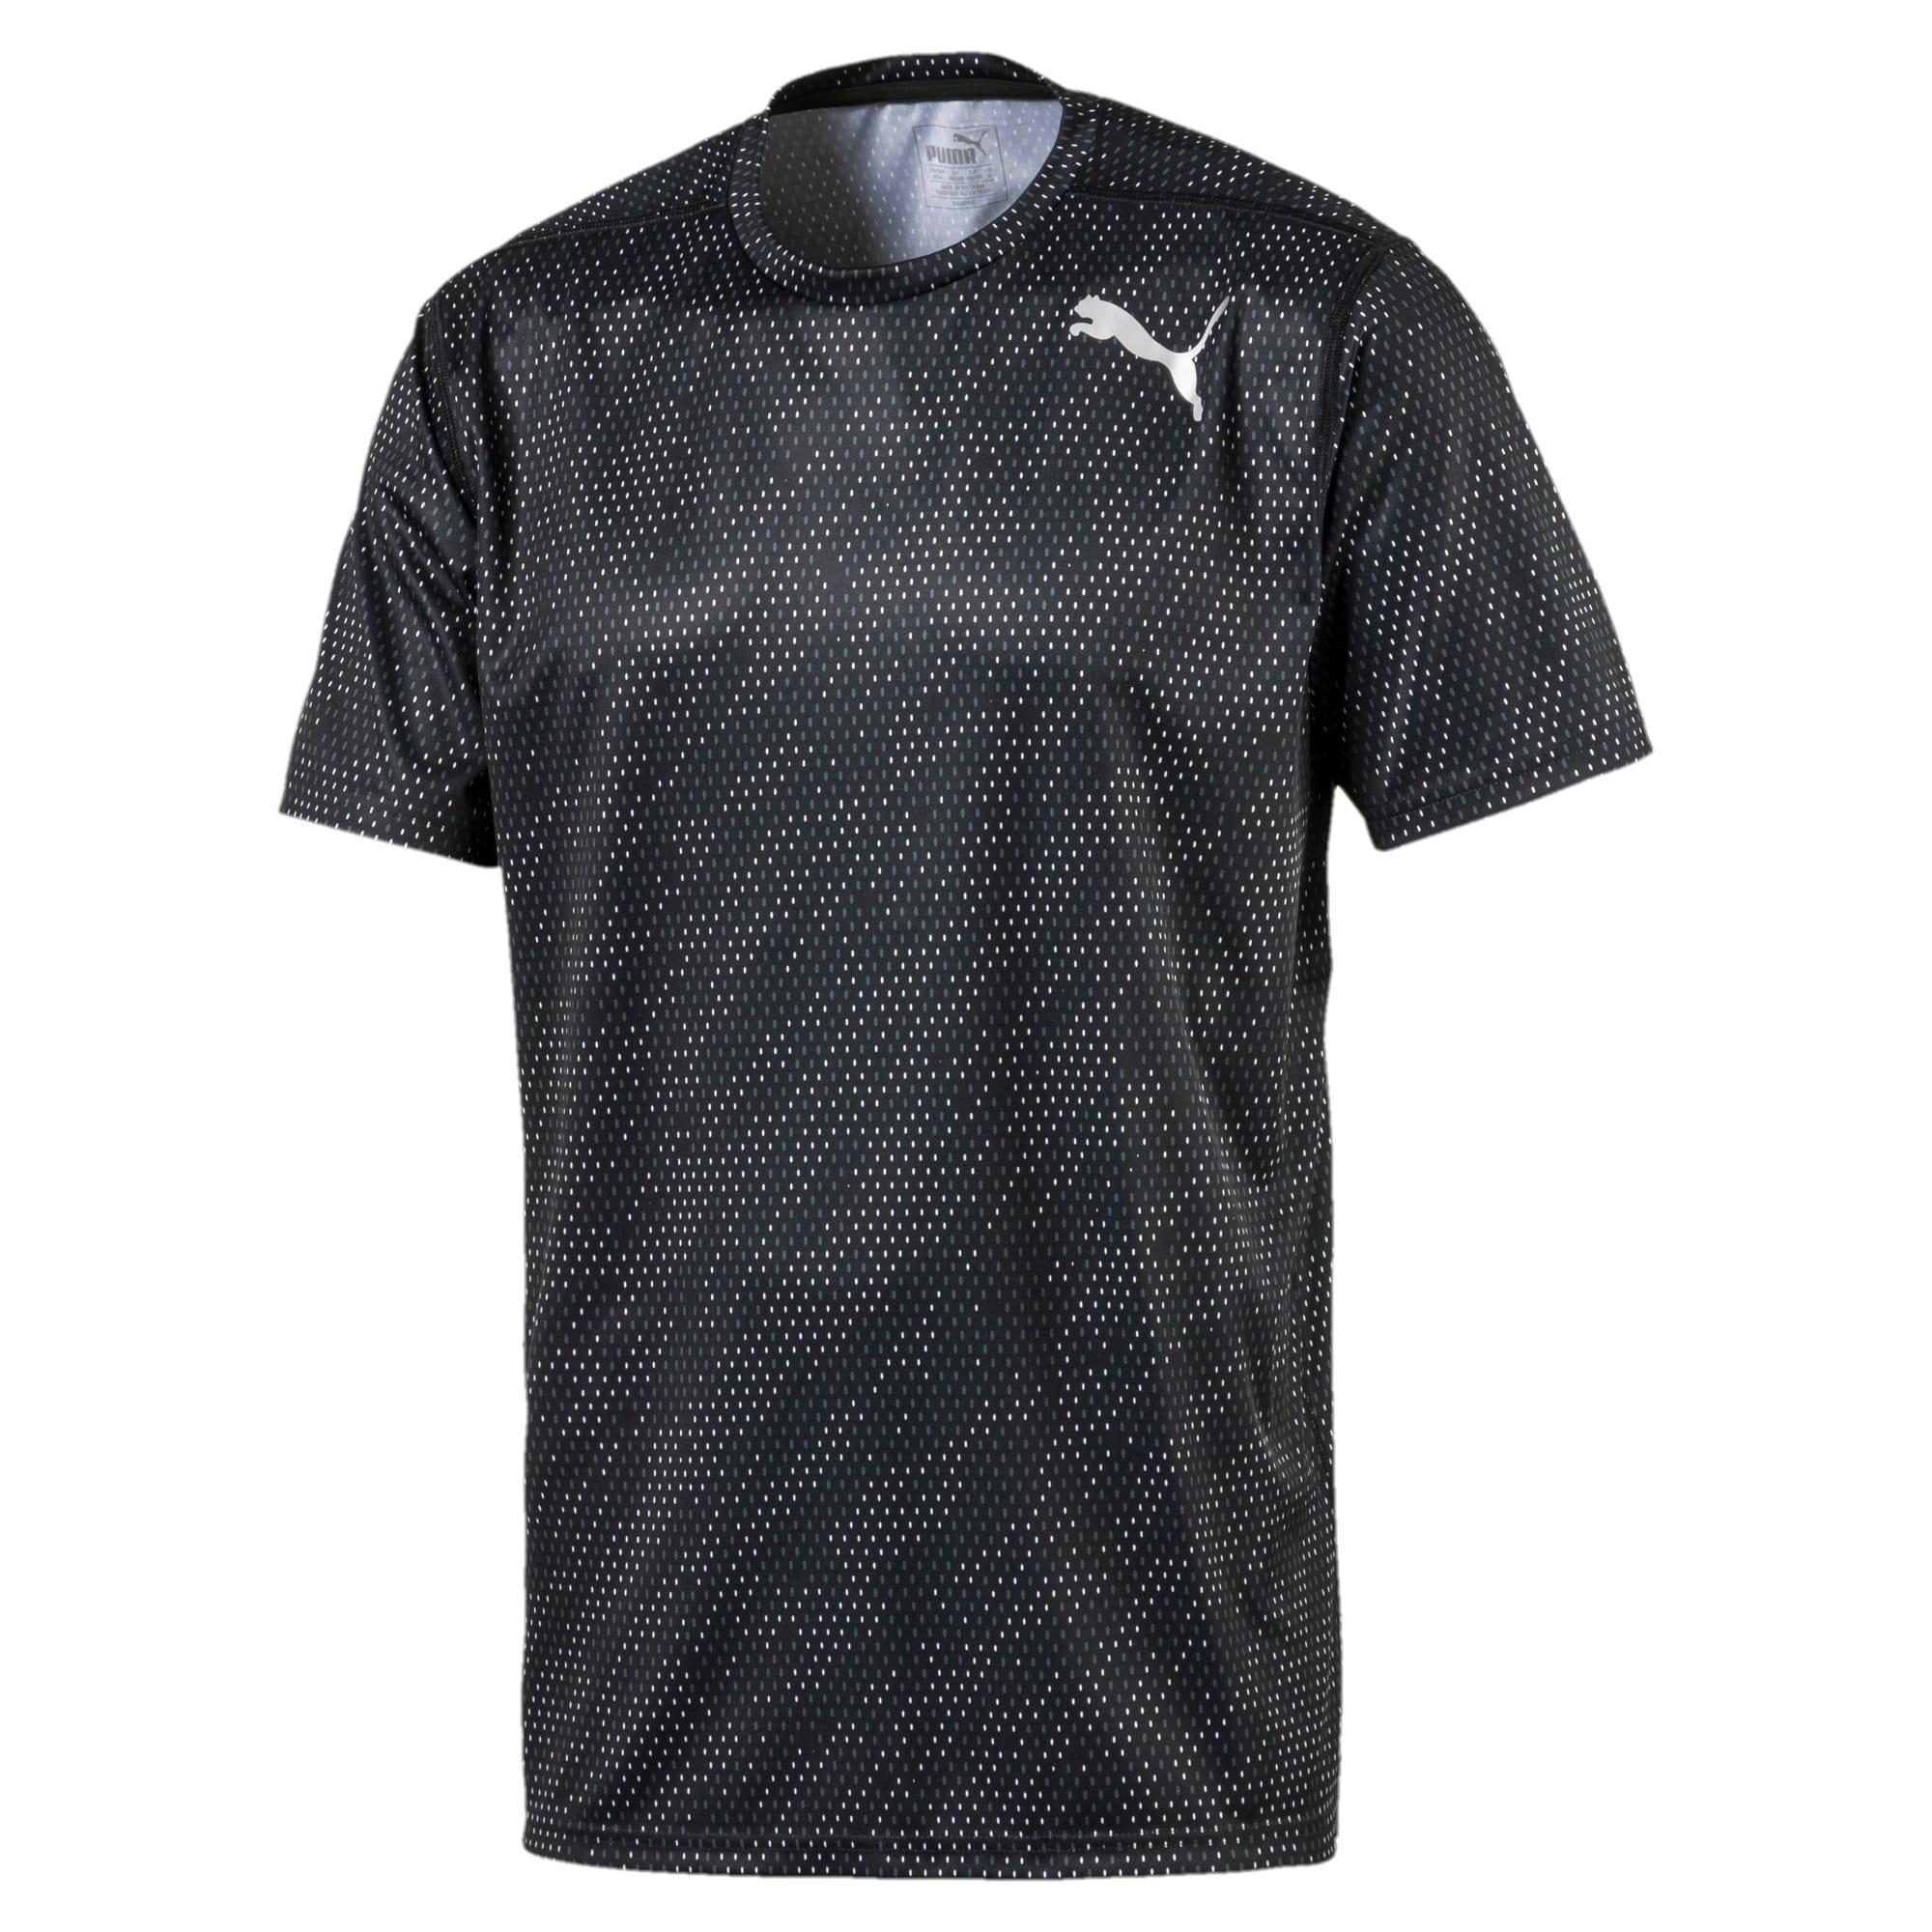 Thumbnail 4 of Training Men's Tech Graphic T-Shirt, puma black-Q3, medium-IND